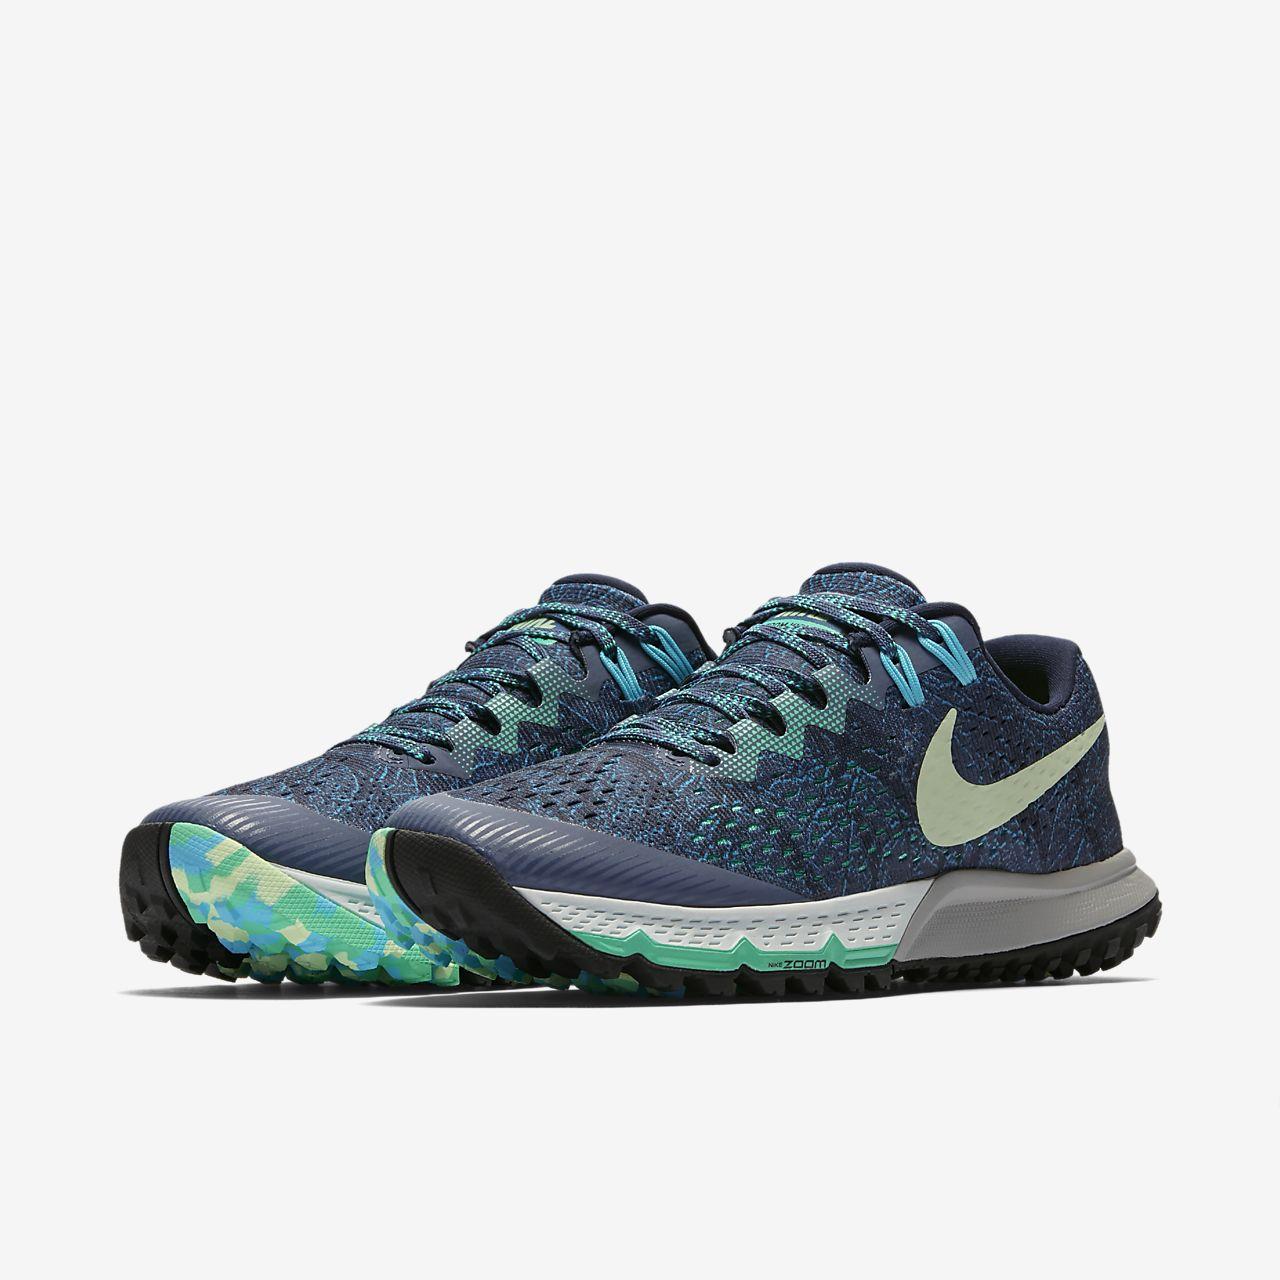 8cfa847fb7263 Calzado de running para mujer Nike Air Zoom Terra Kiger 4. Nike.com CL